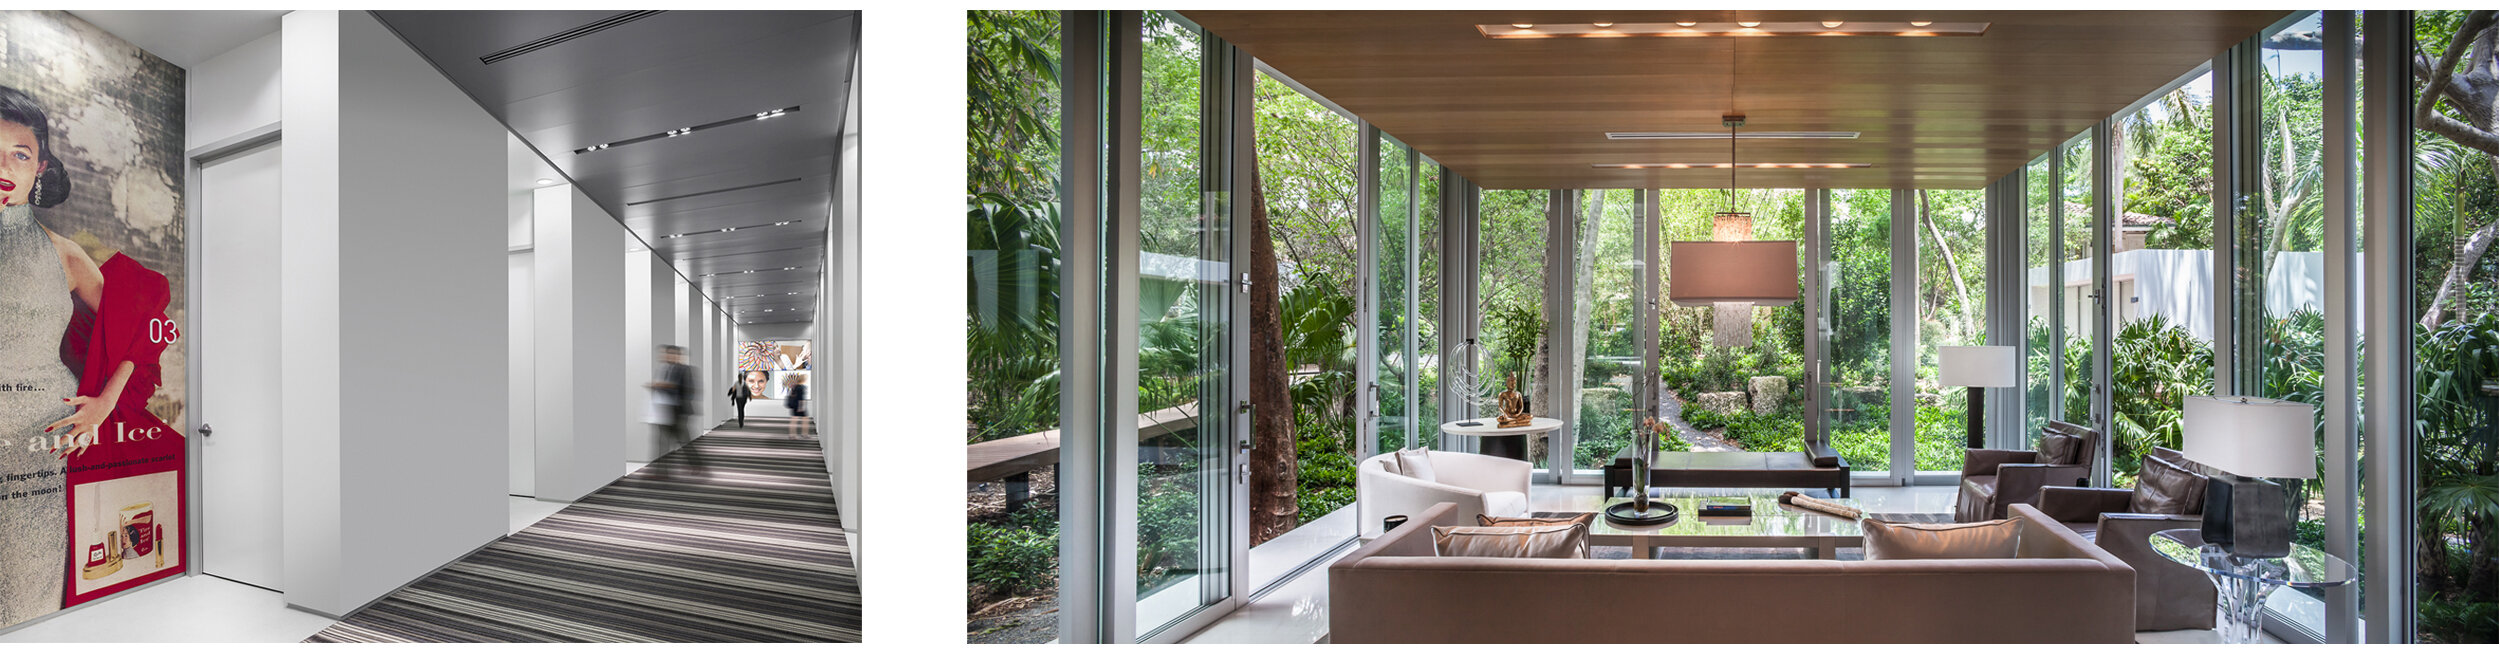 Collins & Dupont Design Group news — shulman + associates | design · architecture interior